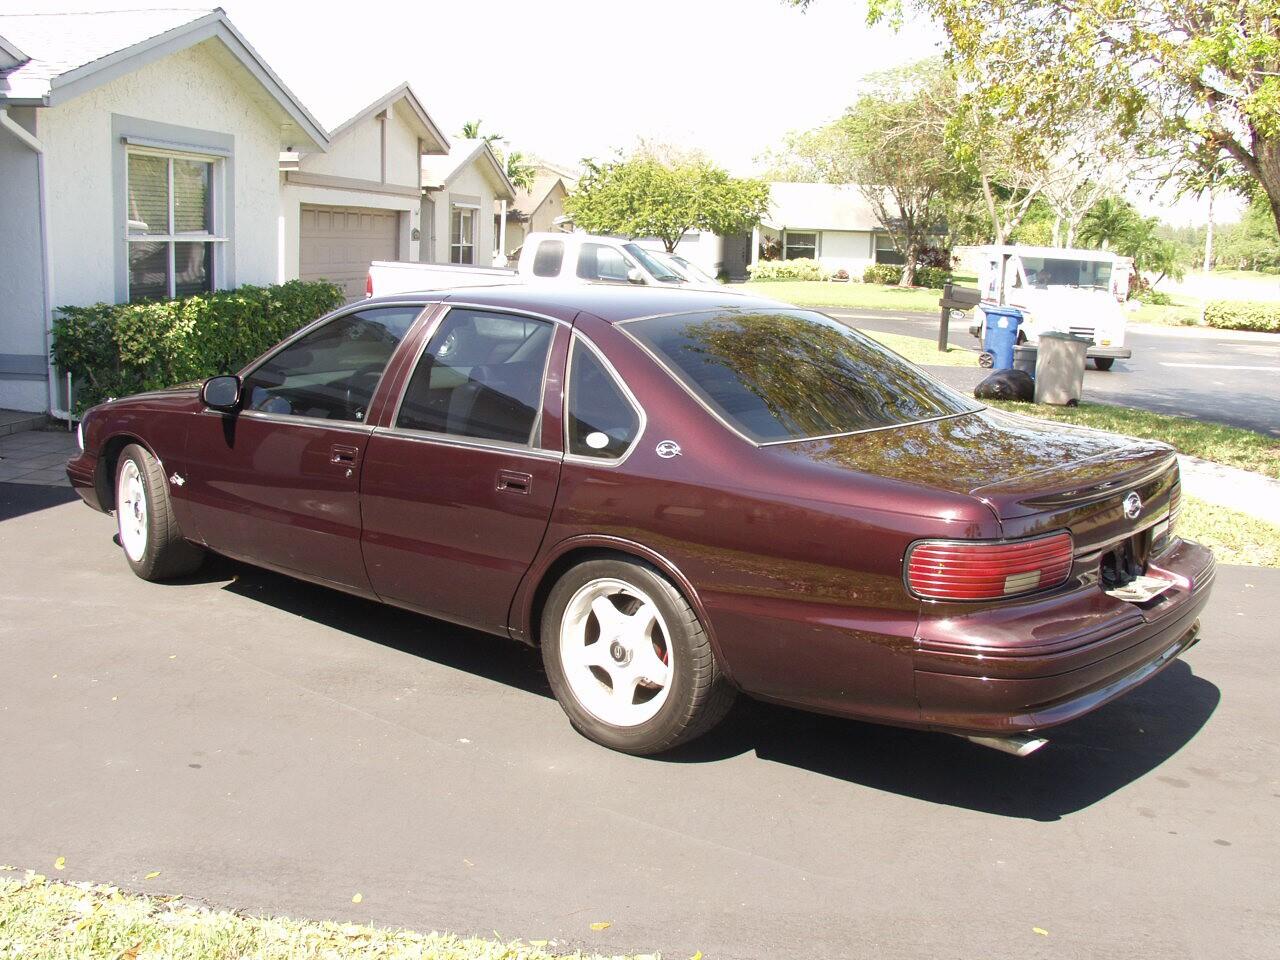 1996 impala ss headers for sale autos post. Black Bedroom Furniture Sets. Home Design Ideas